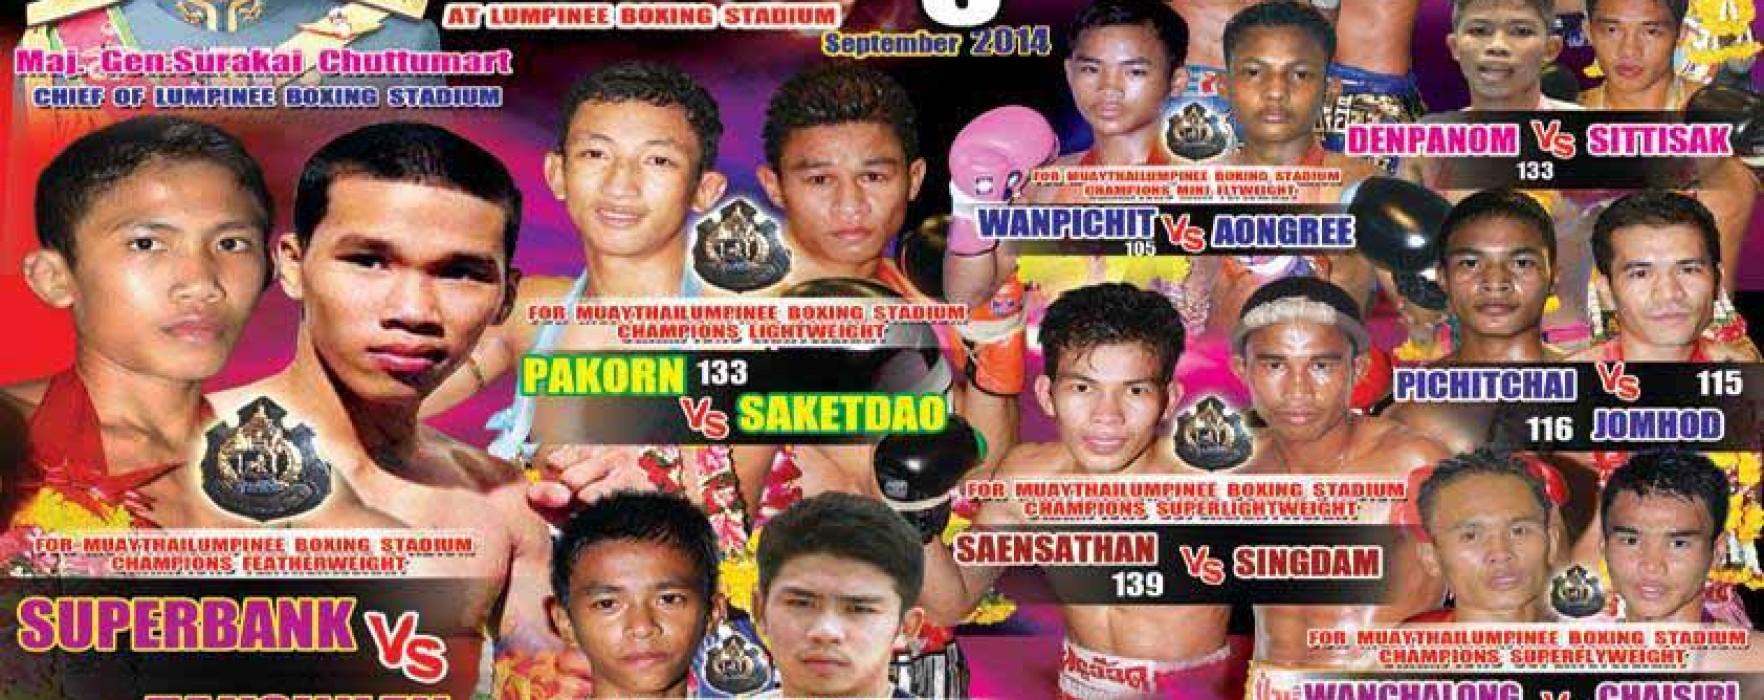 Card: Lumpinee Superfight – Superbank, Saketdao, Pakorn, Singdam & others – 5th September 2014